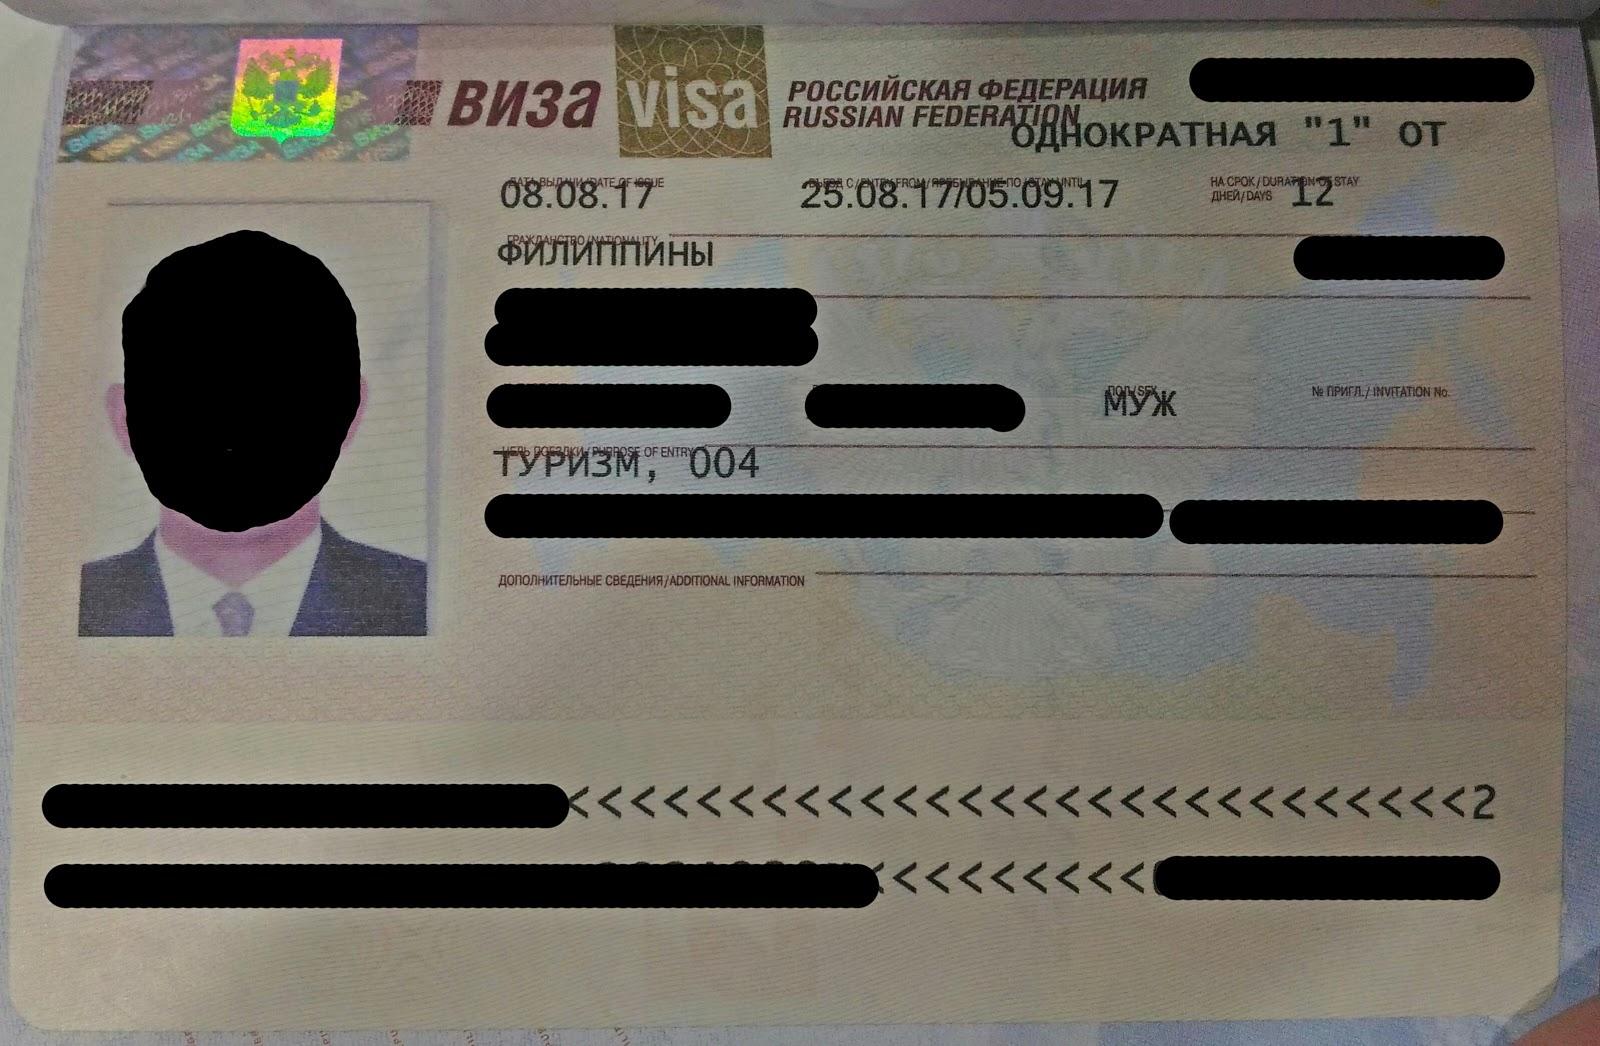 philippine passport application fee 2017